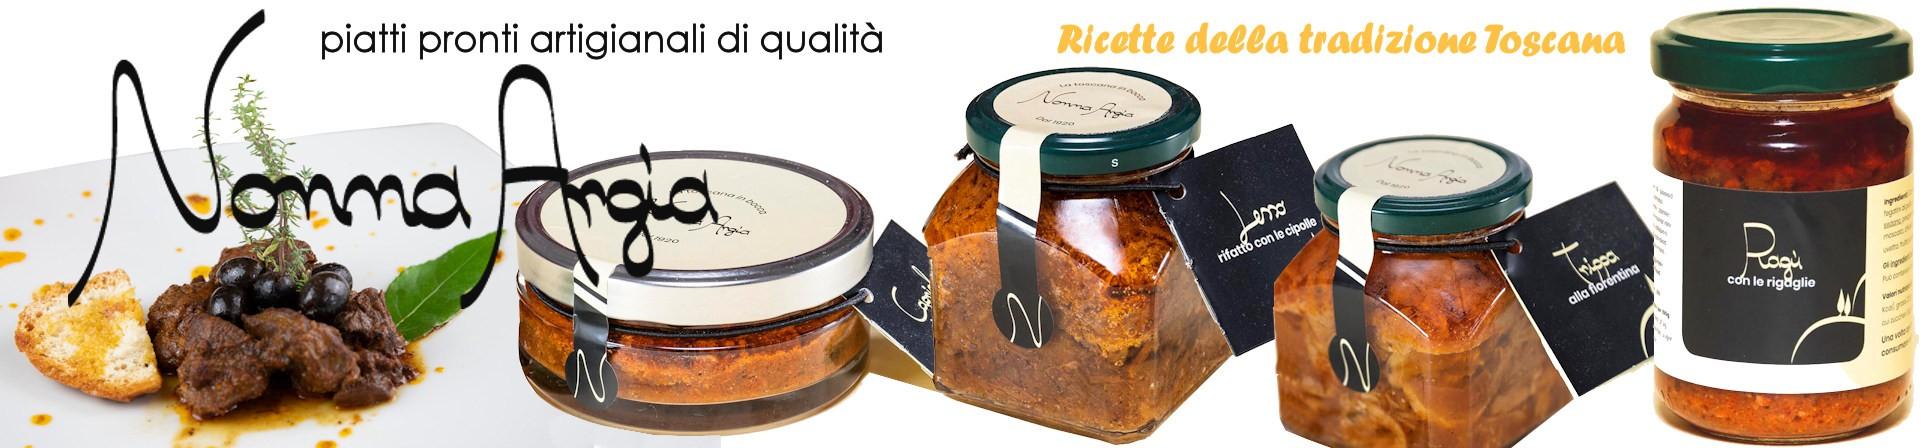 vendita online piatti pronti cucina toscana - NONNA ARGIA